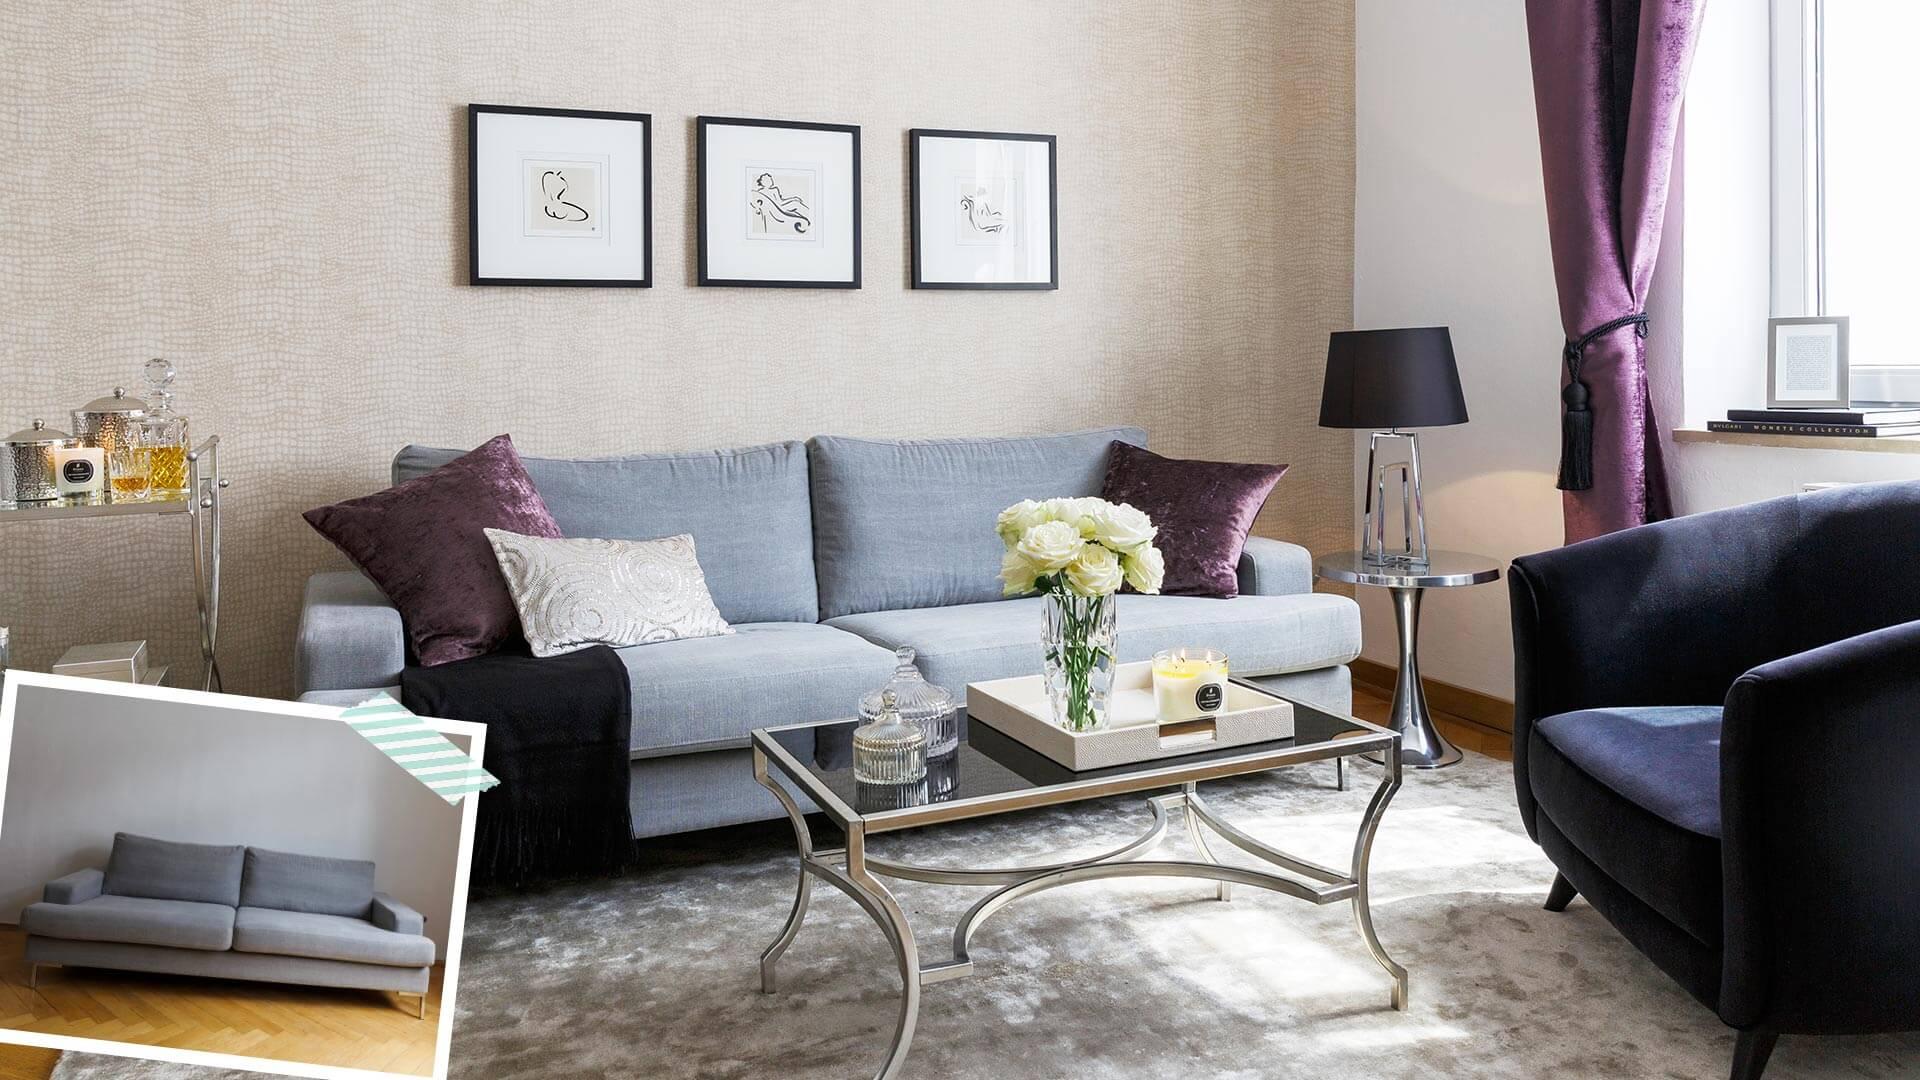 Sofa-Style: Glam